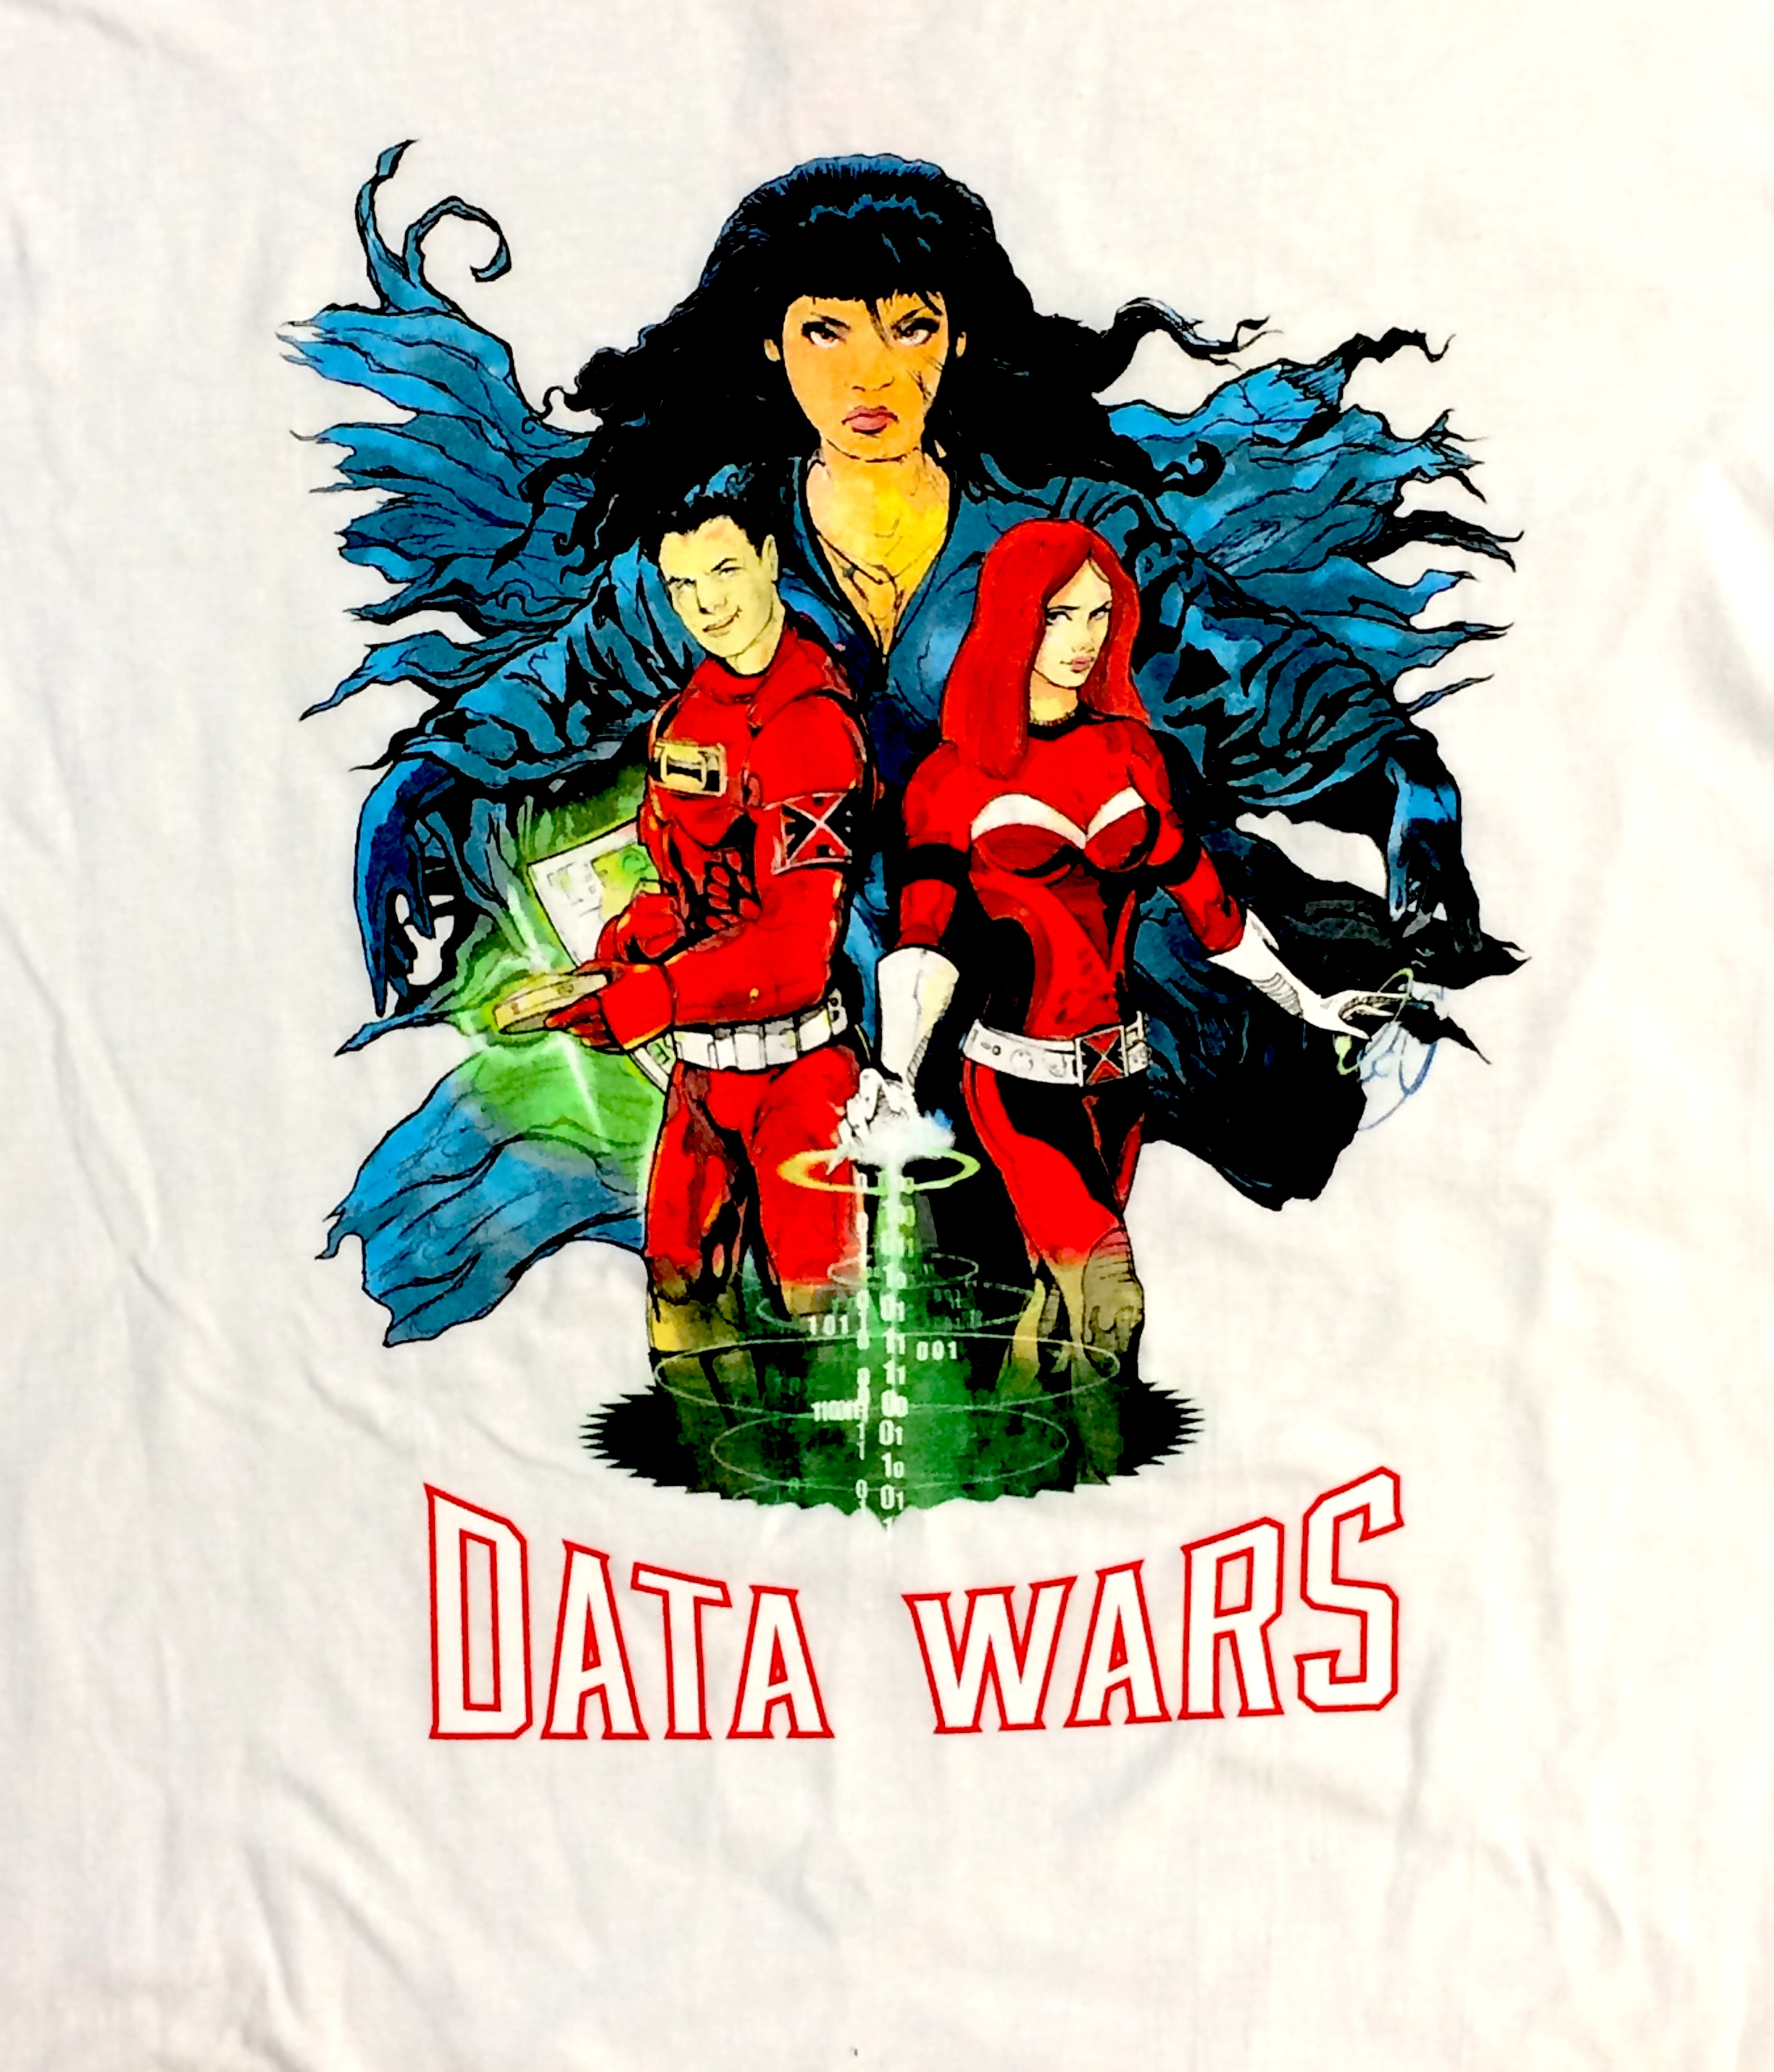 sh-data-wars.jpg